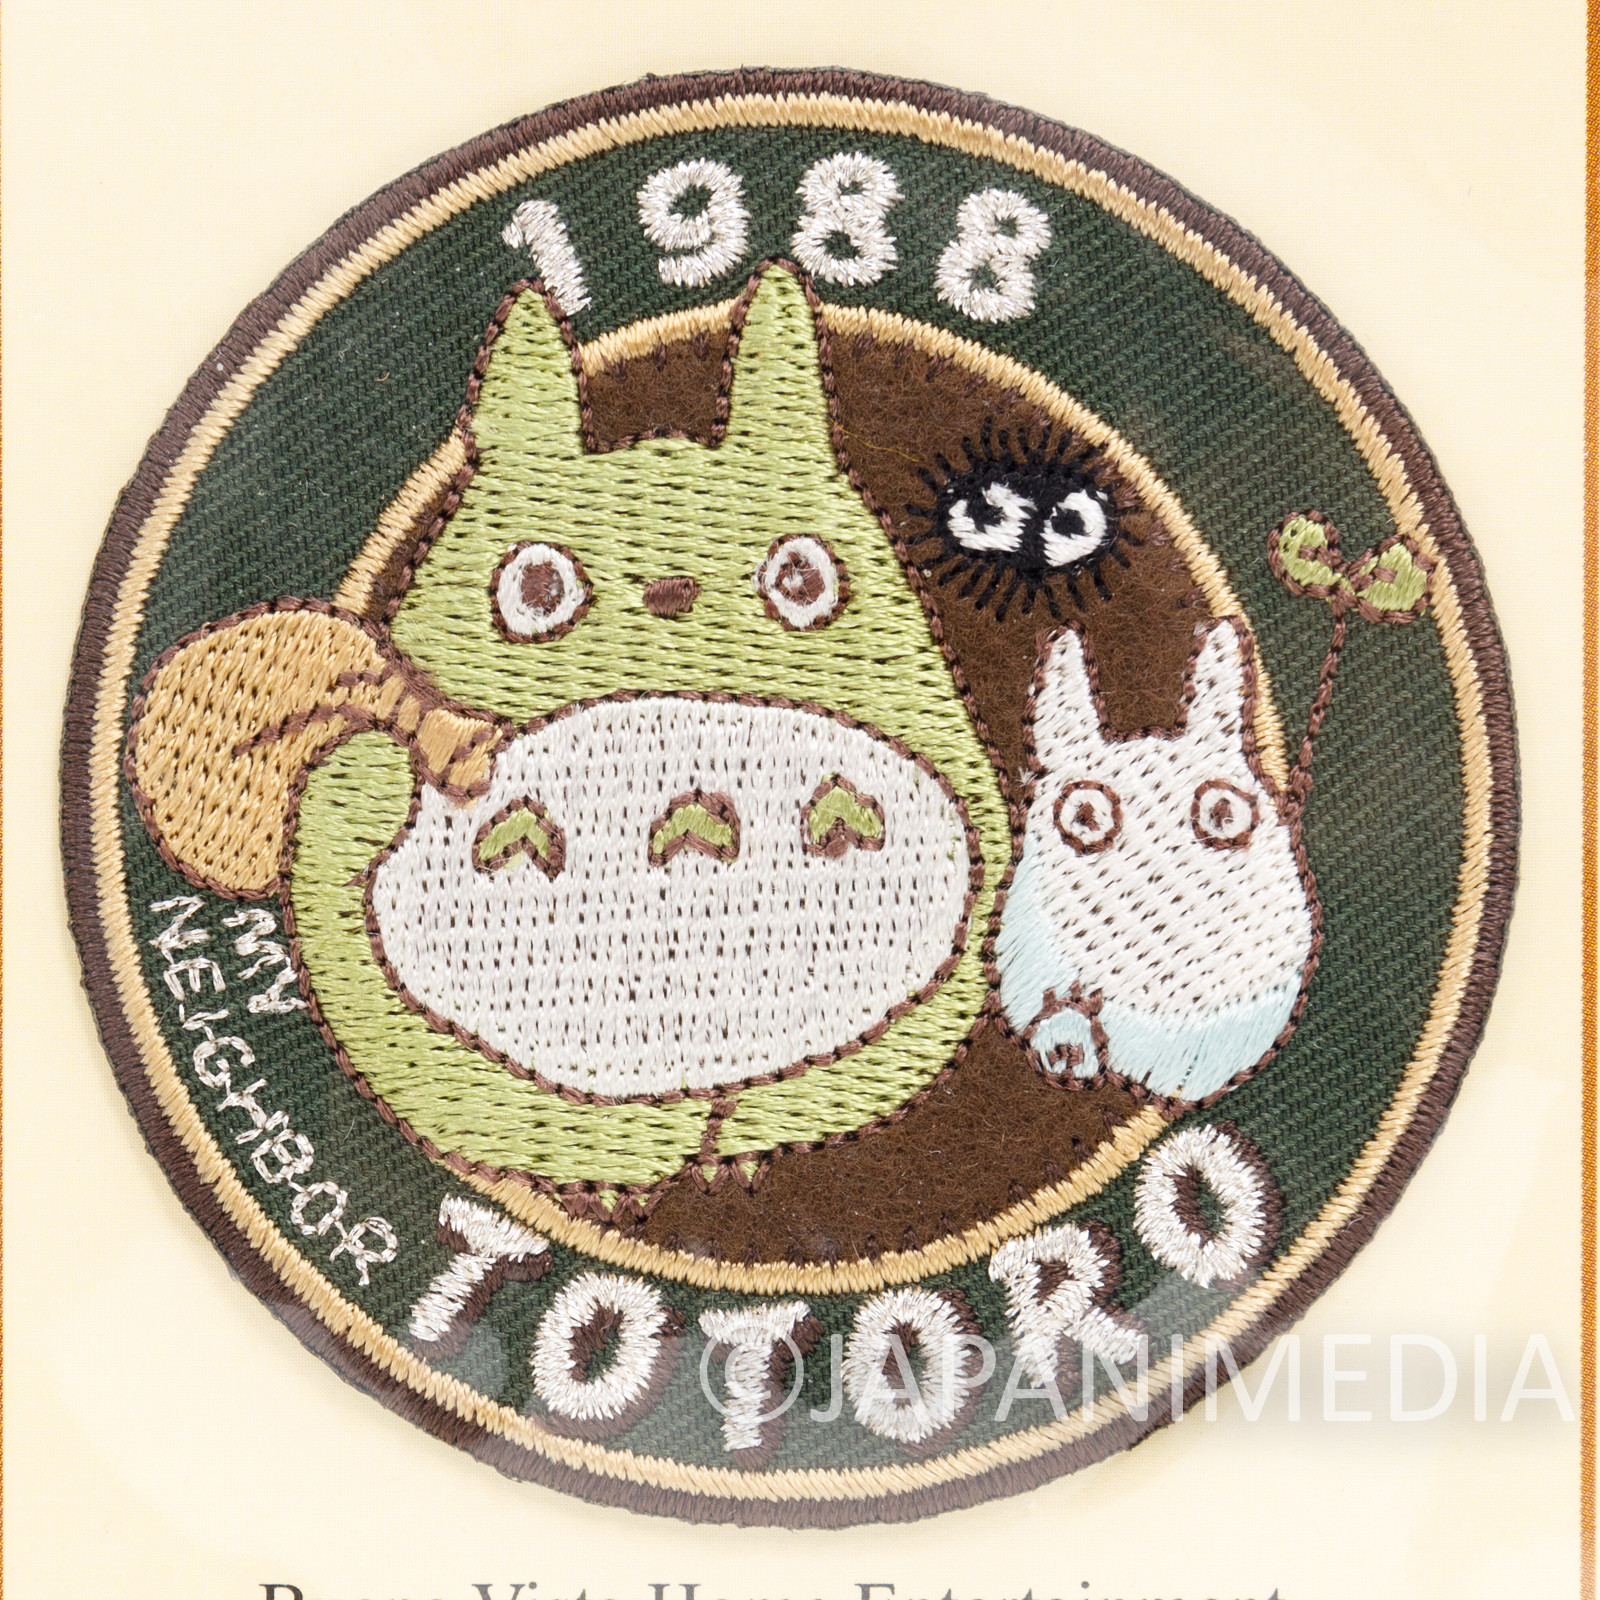 My Neighbor Totoro Emblem Badge Wappen Ghibli JAPAN ANIME